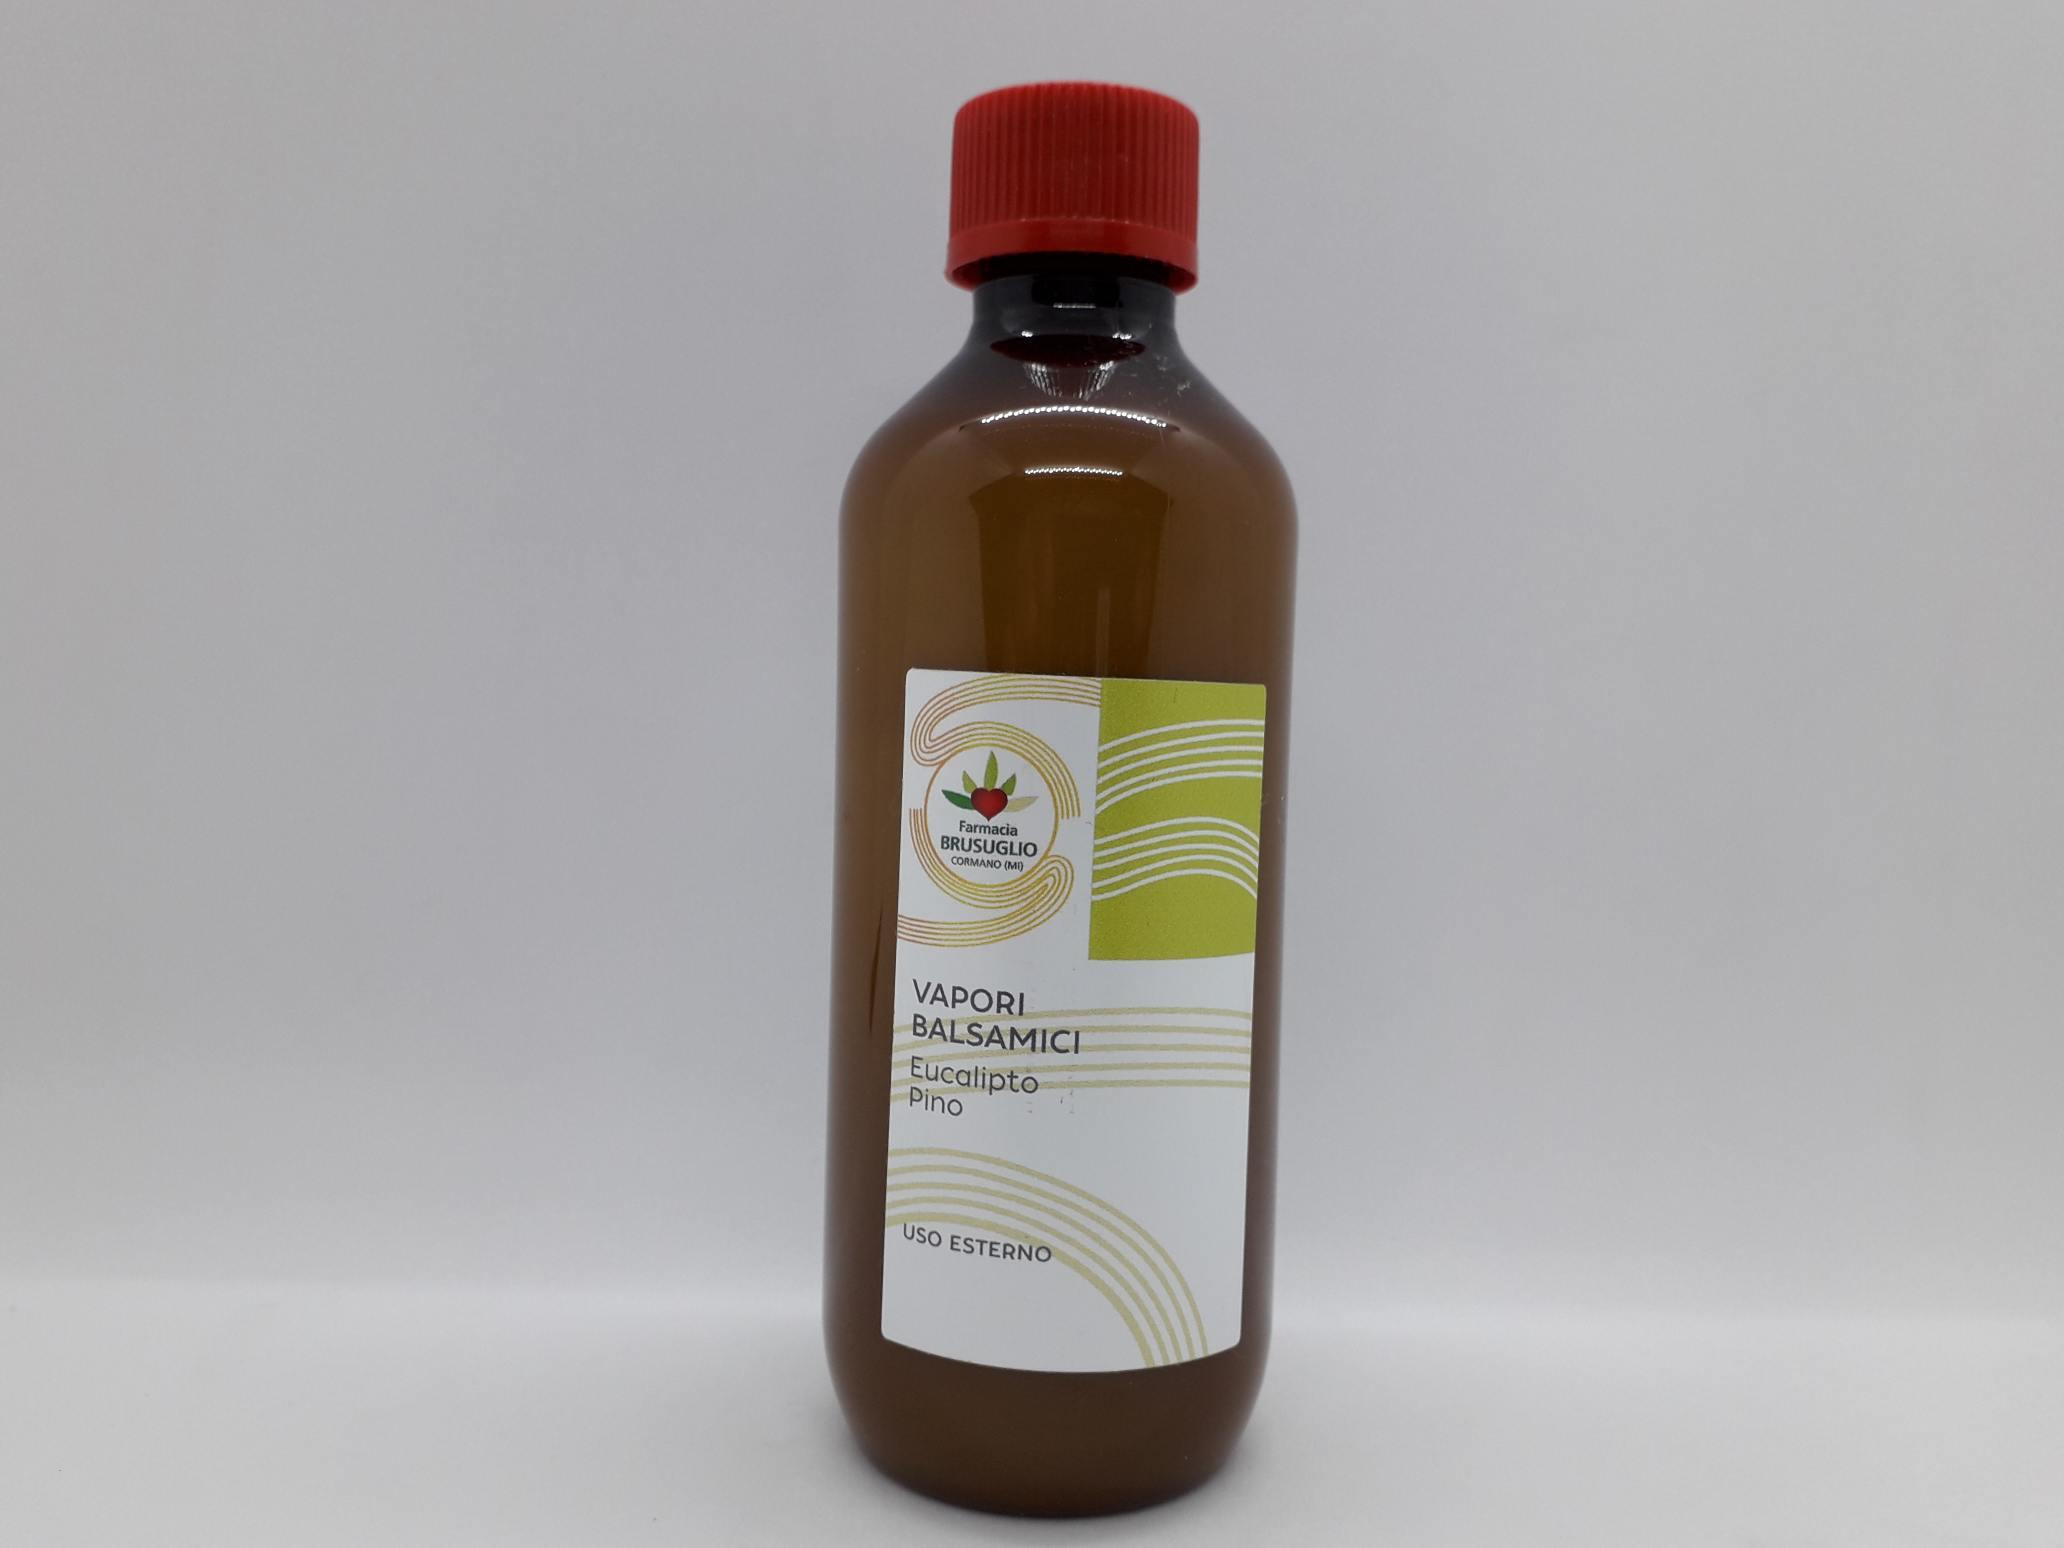 LFP VAPORI BALSAMICI 200ML - Farmaciaempatica.it